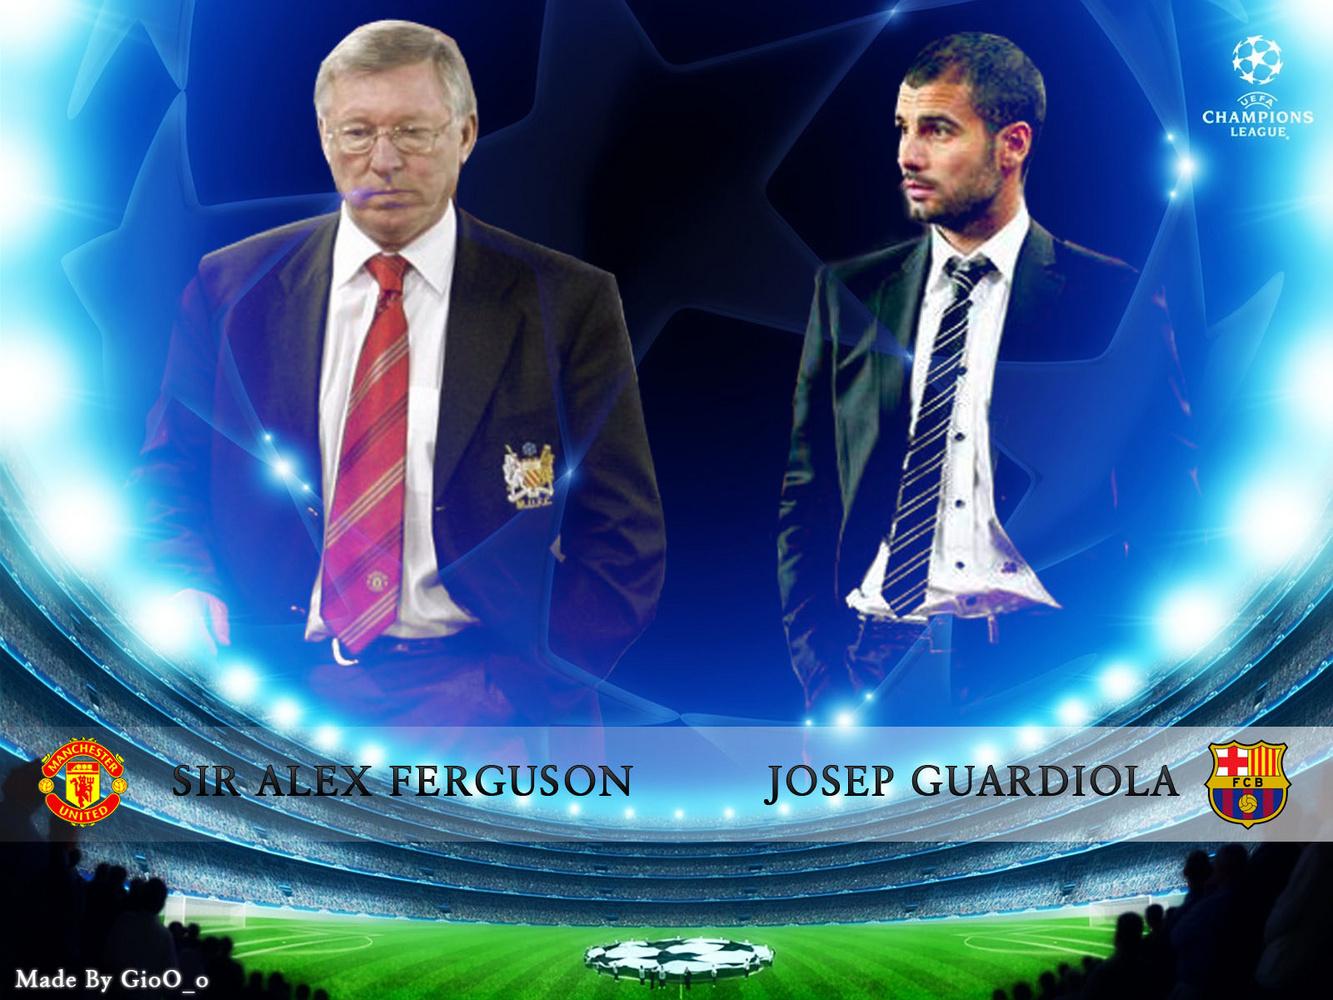 http://3.bp.blogspot.com/-xIQxGs2BOsw/Td0JhB-HQnI/AAAAAAAACfI/5ty0ZDYpy6E/s1600/MU-Barca-Ferguson-vs-Pep-Guardiola-Wallpaper-1024x768-2.jpg